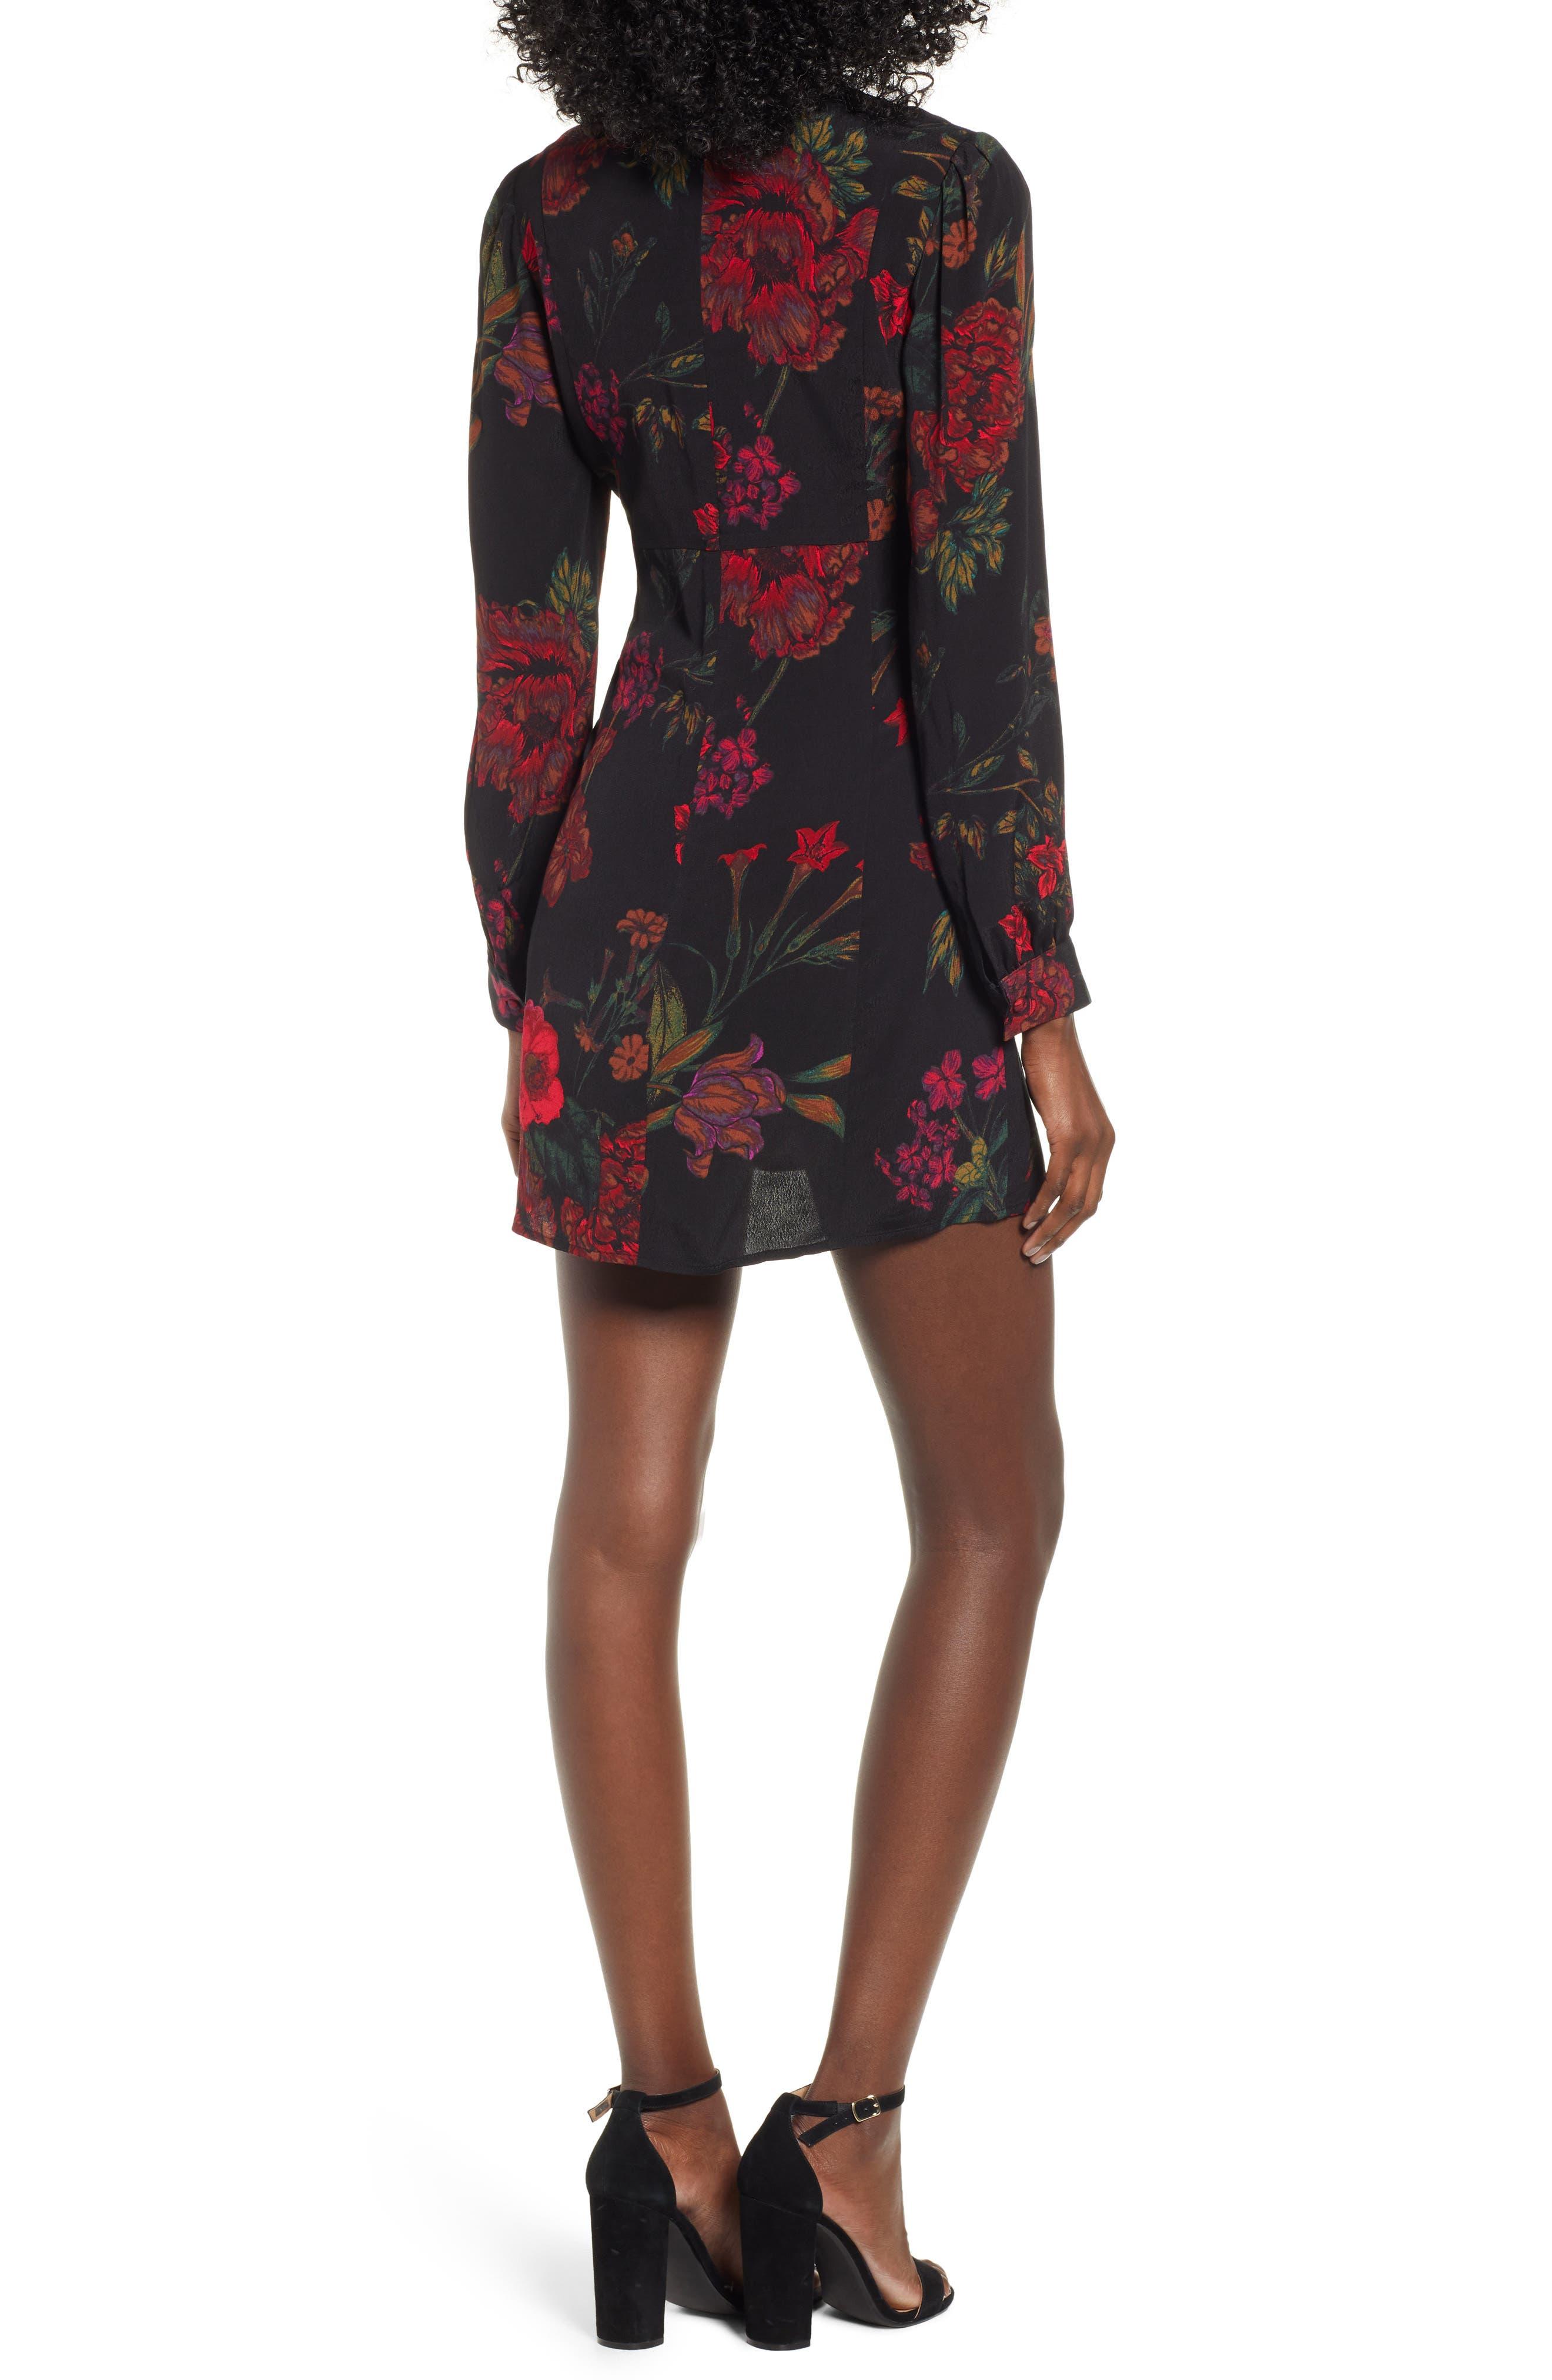 V-Neck Floral Print Minidress,                             Alternate thumbnail 2, color,                             BLACK STATEMENT FLORAL